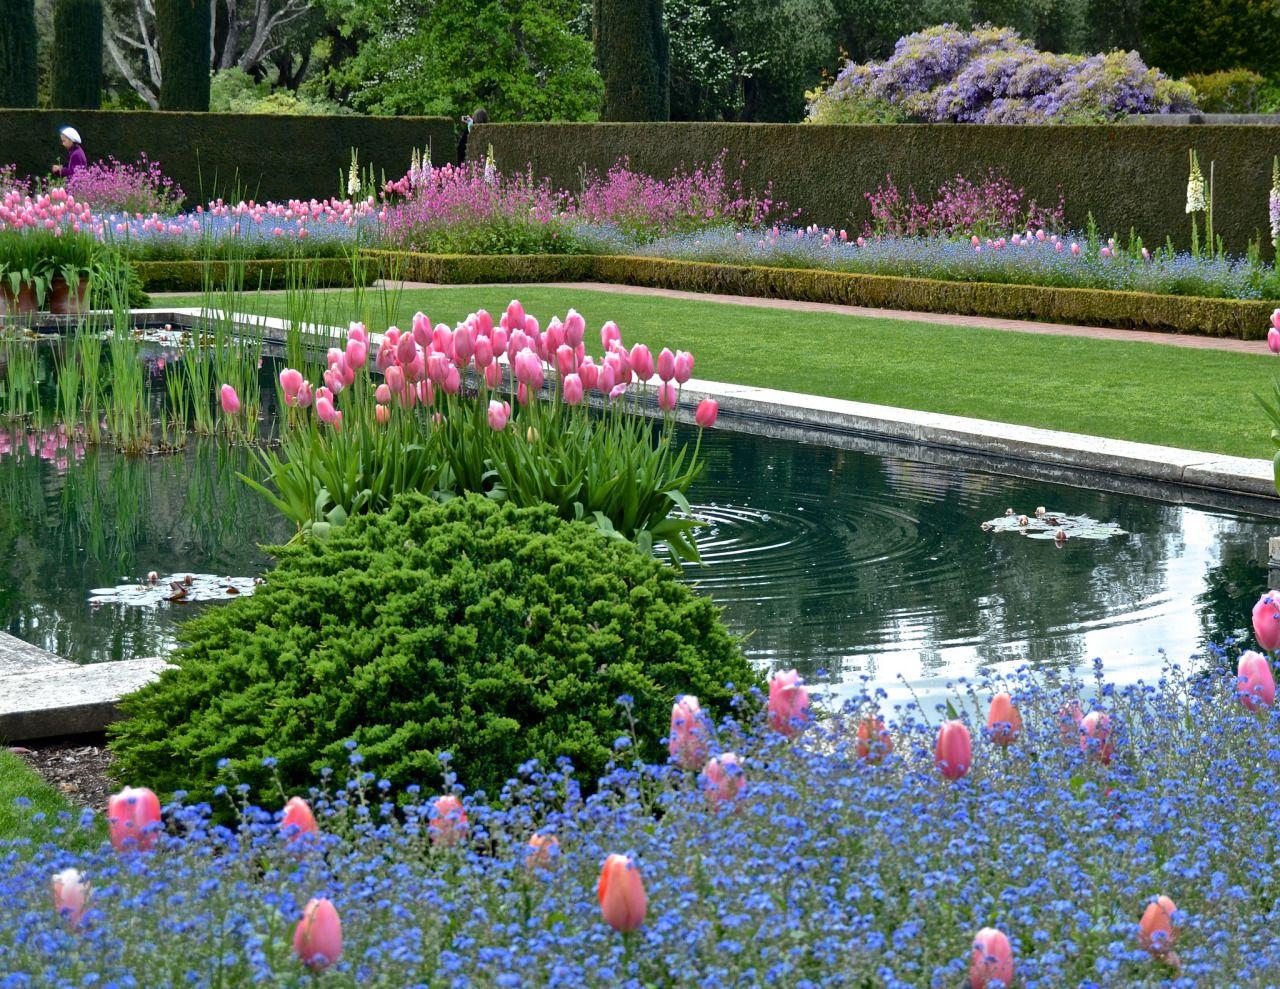 carex: garden design by carolyn mullet | Jardines 23 | Pinterest ...